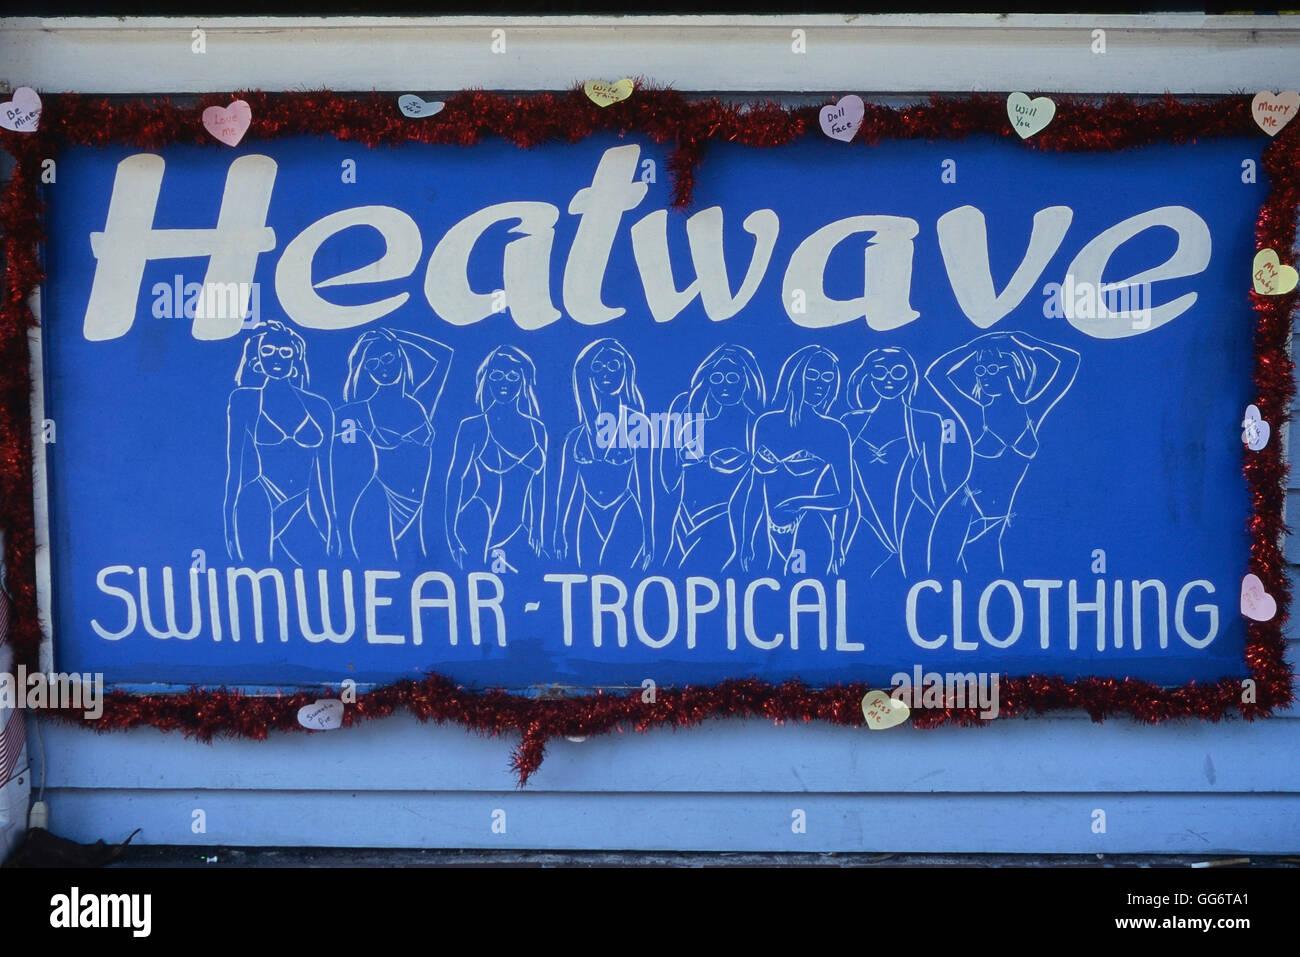 Heatwave swimwear tropical clothing store sign. Key West. Florida. America - Stock Image